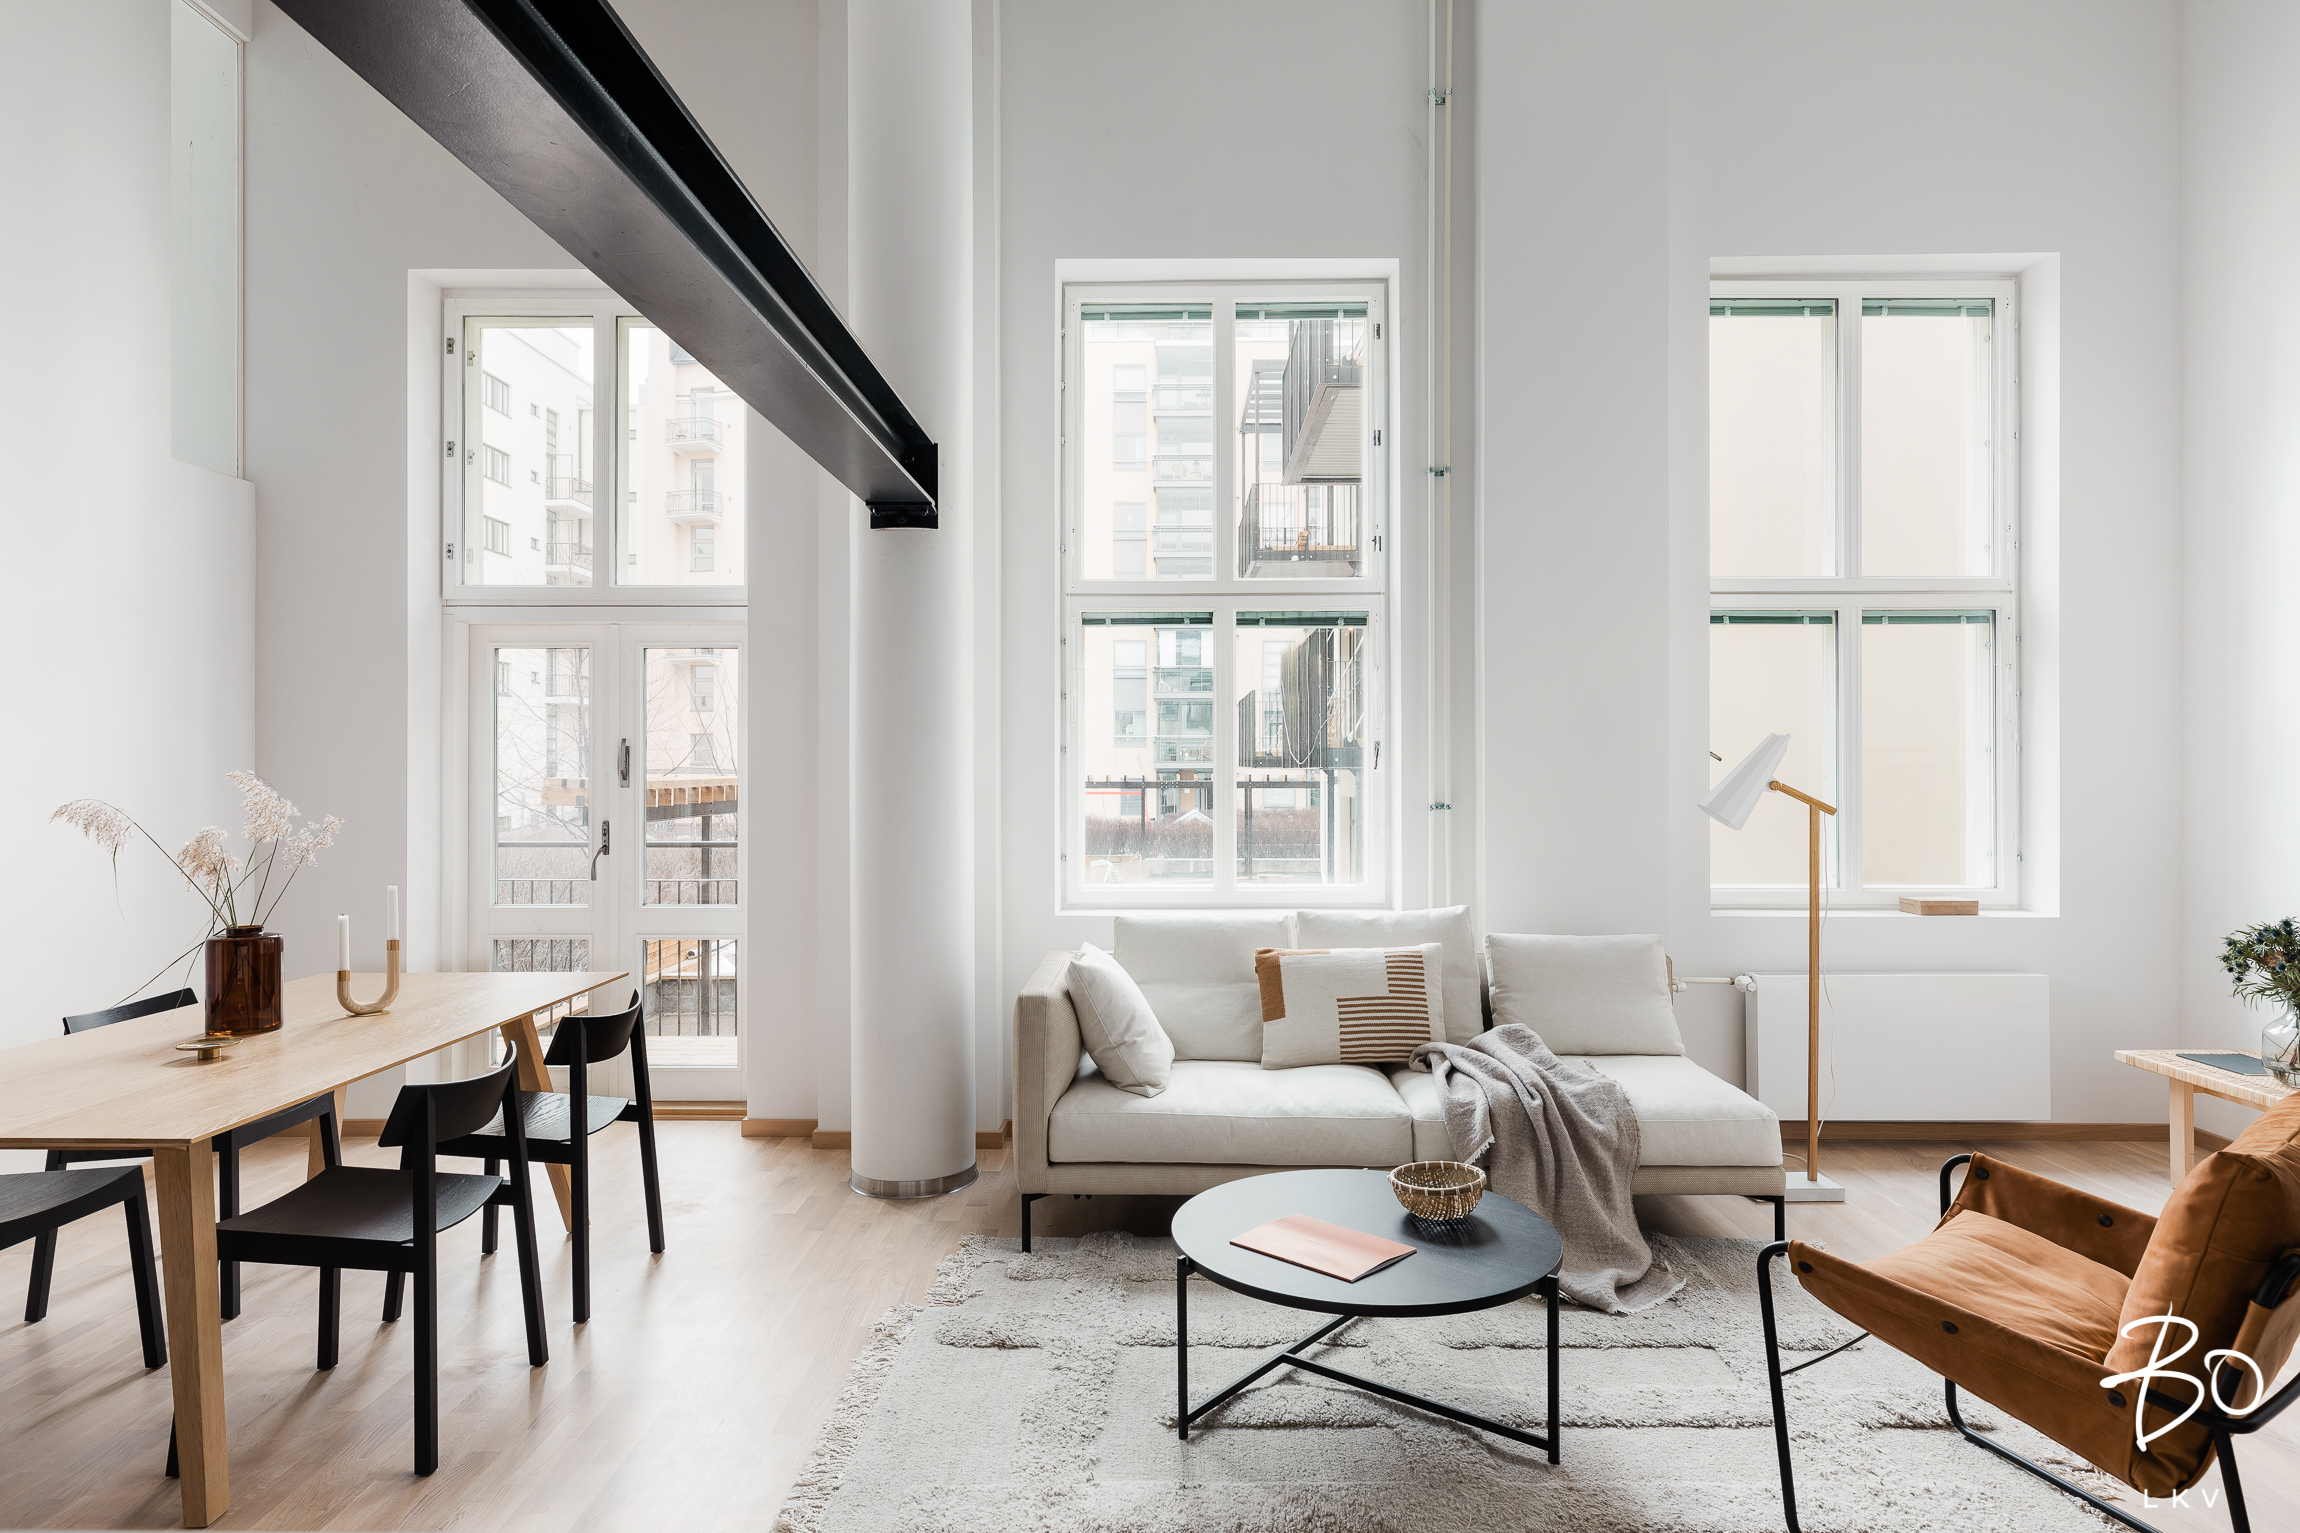 ASUNTO B16 123 m2, 3-5h+avok+s+p